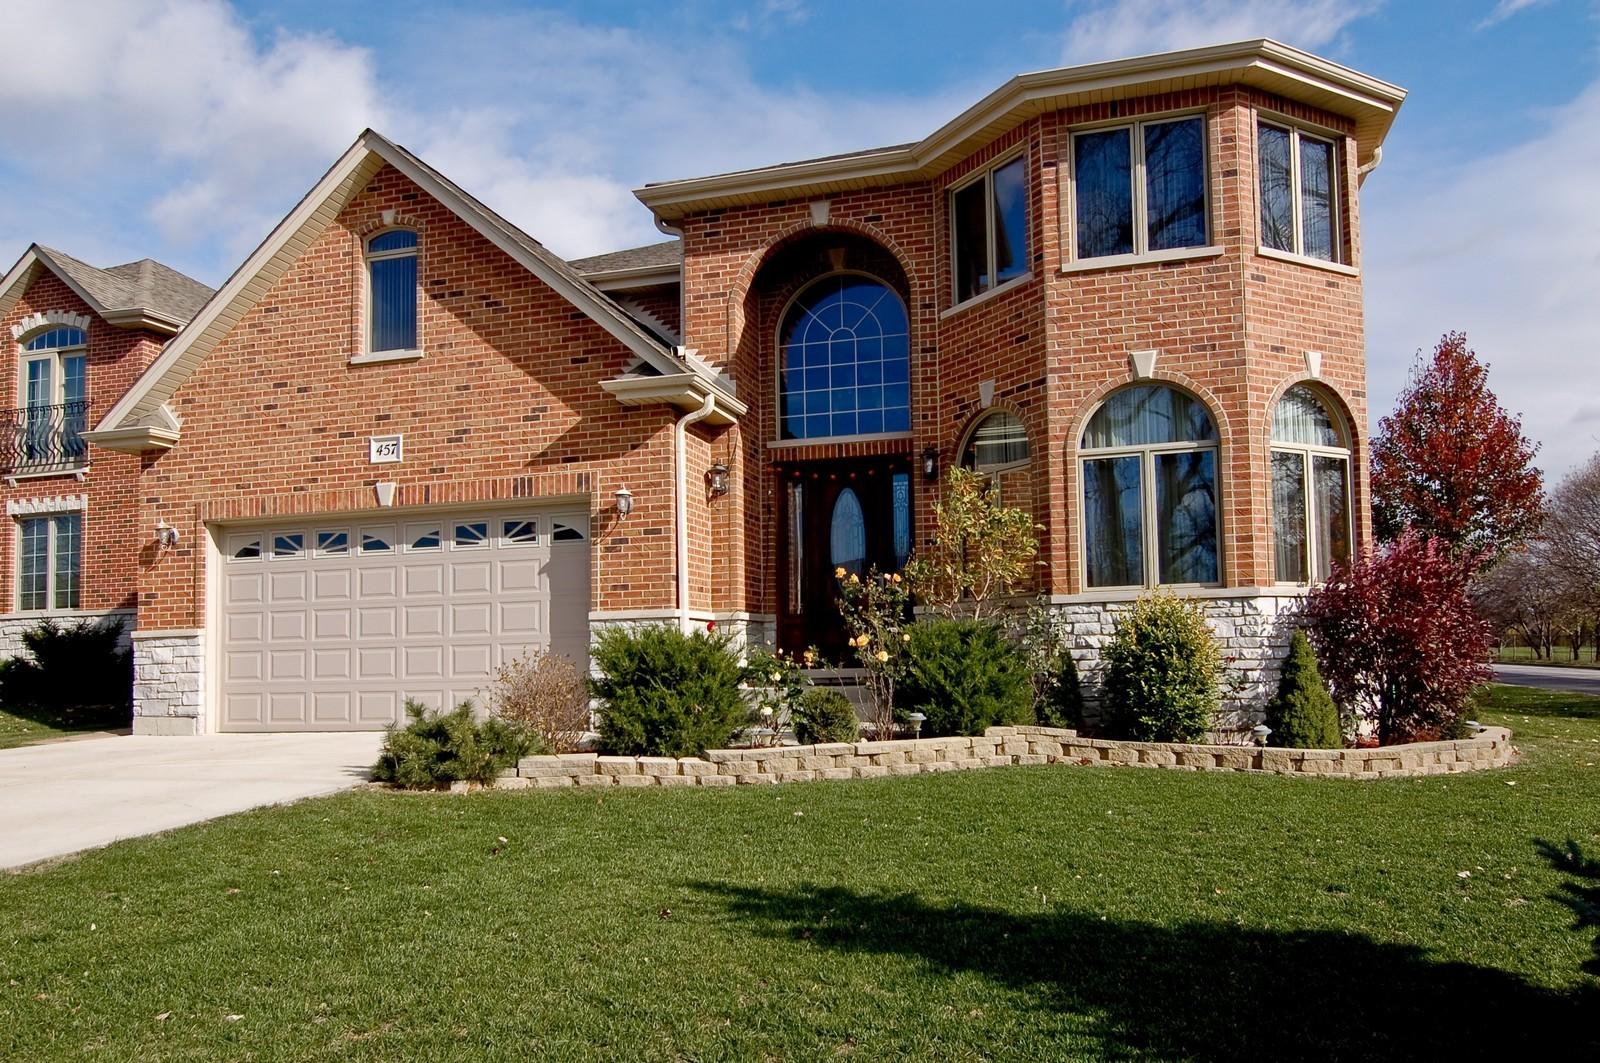 Real Estate Photography - 457 Ellis, Bensenville, IL, 60106 - Front View